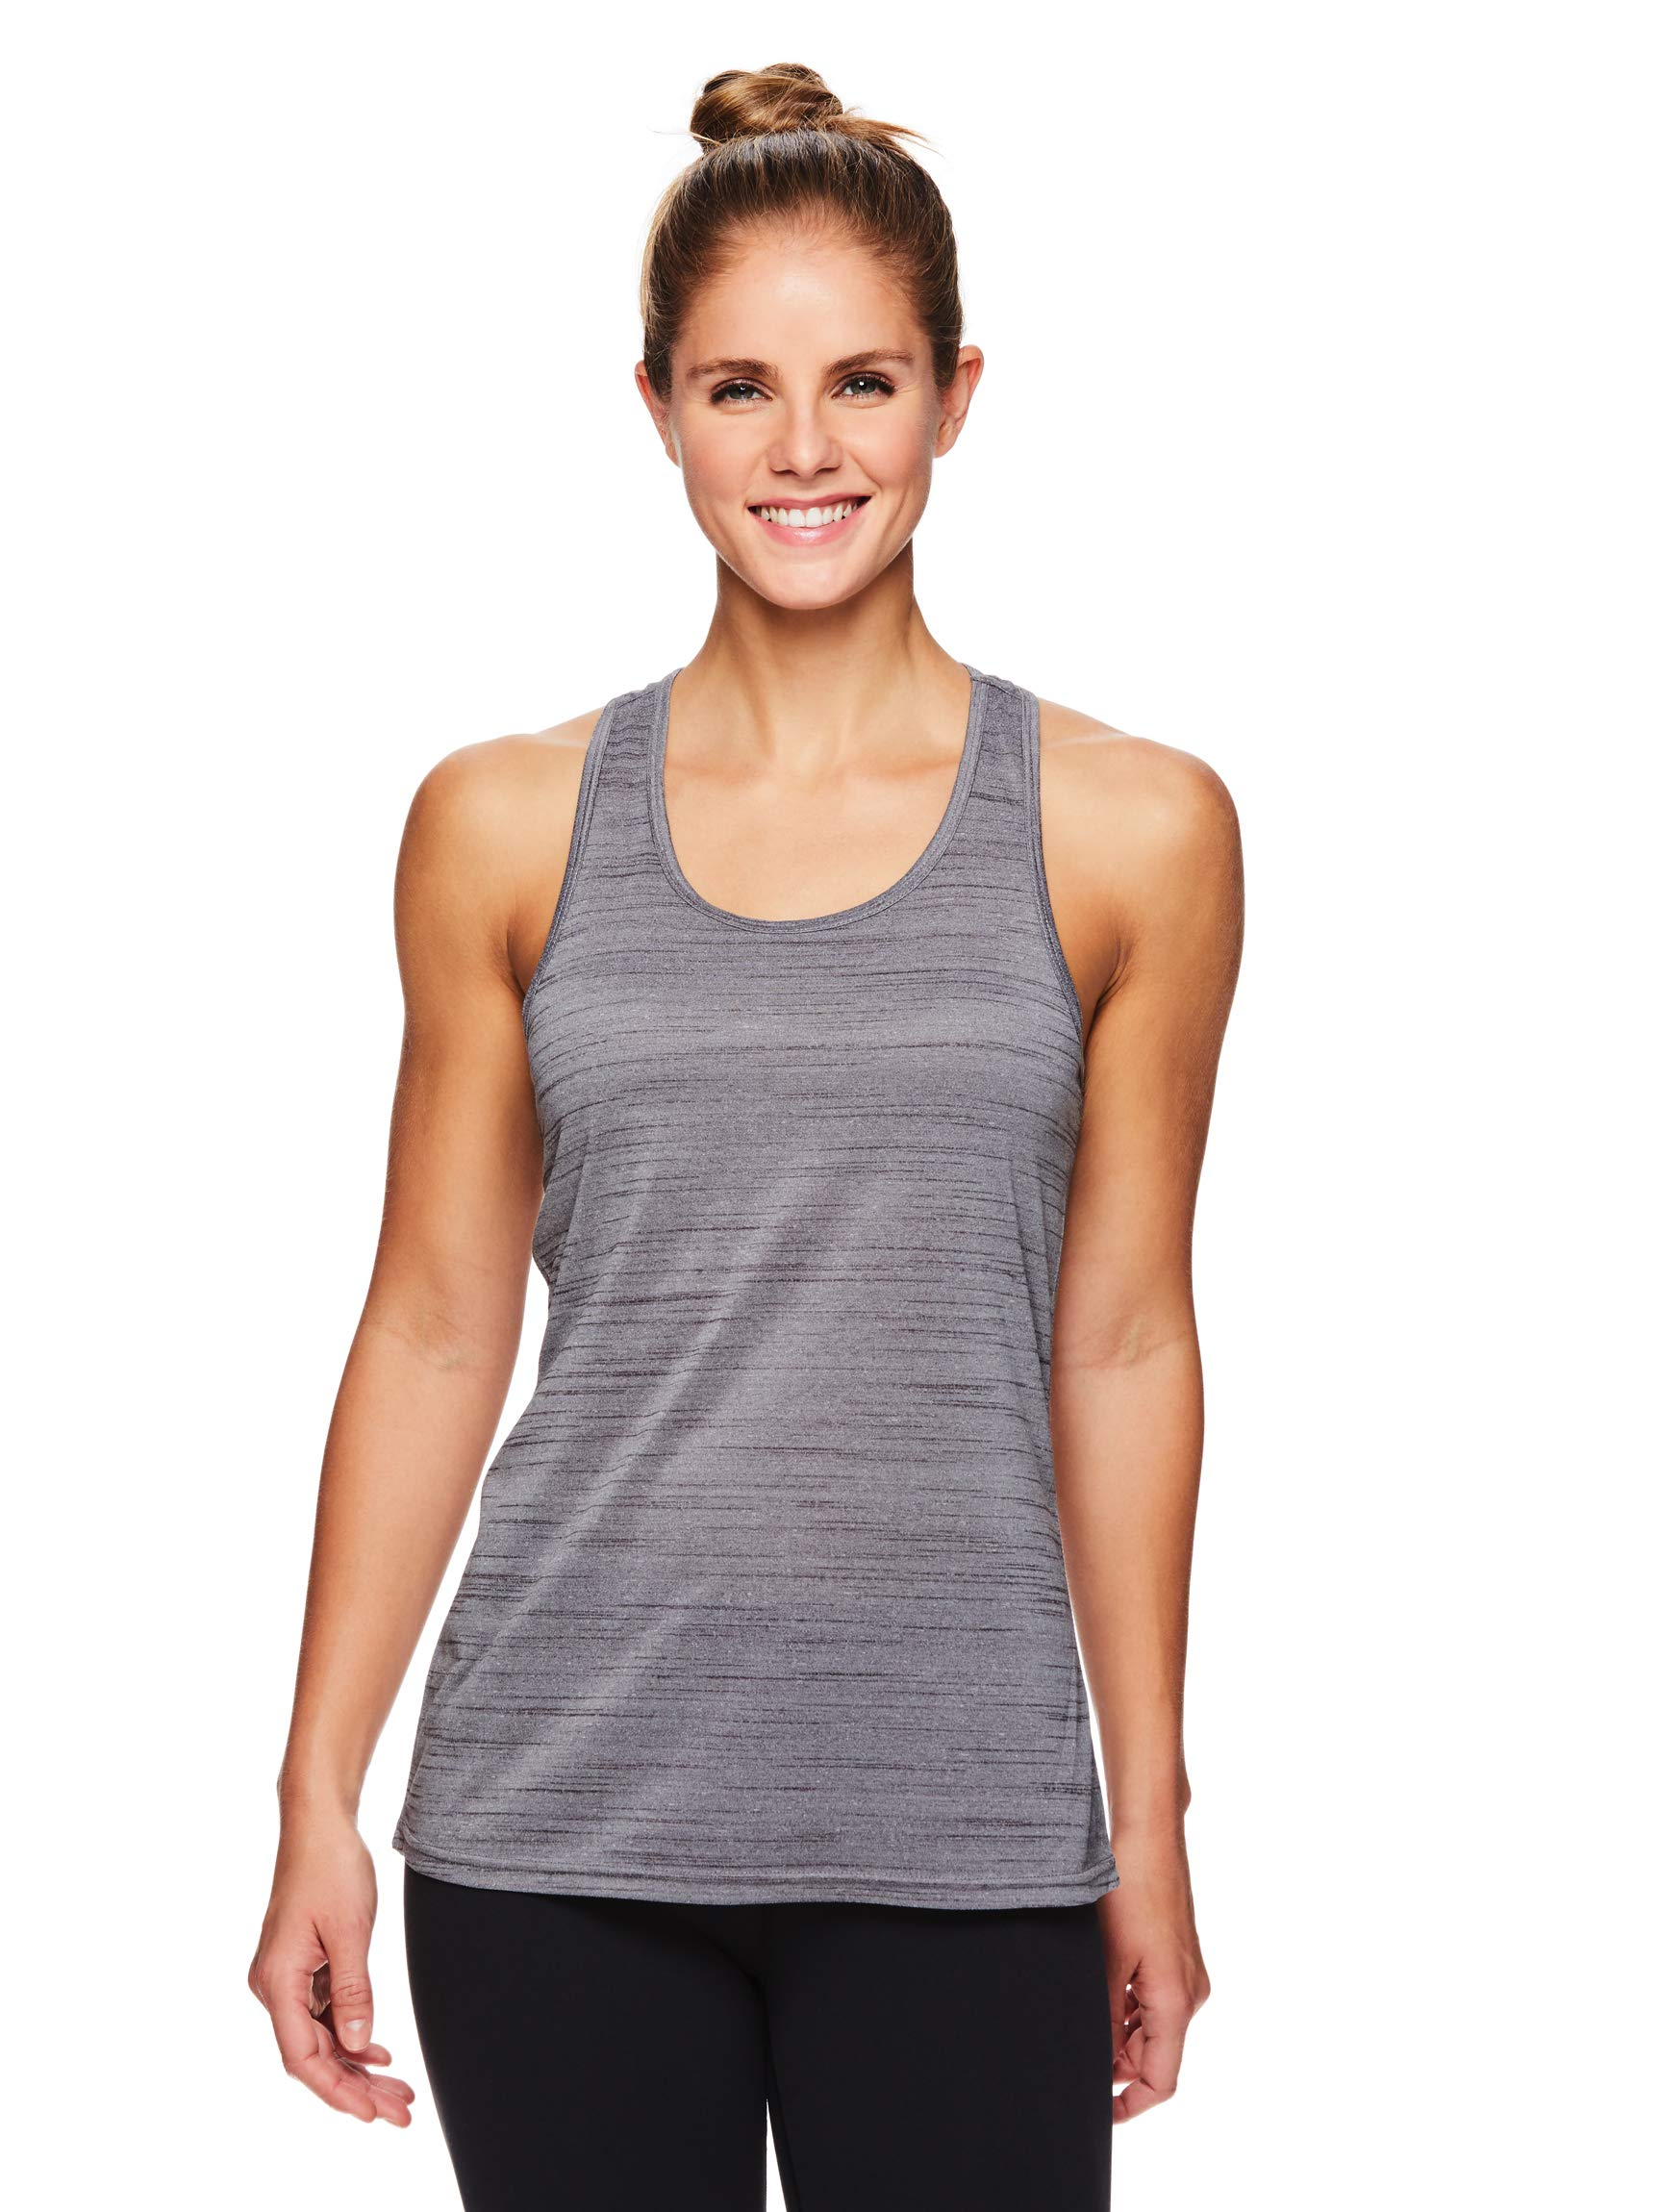 HEAD Women's Racerback Tank Top - Sleeveless Flowy Performance Activewear Shirt - Serenity Heather, X-Small